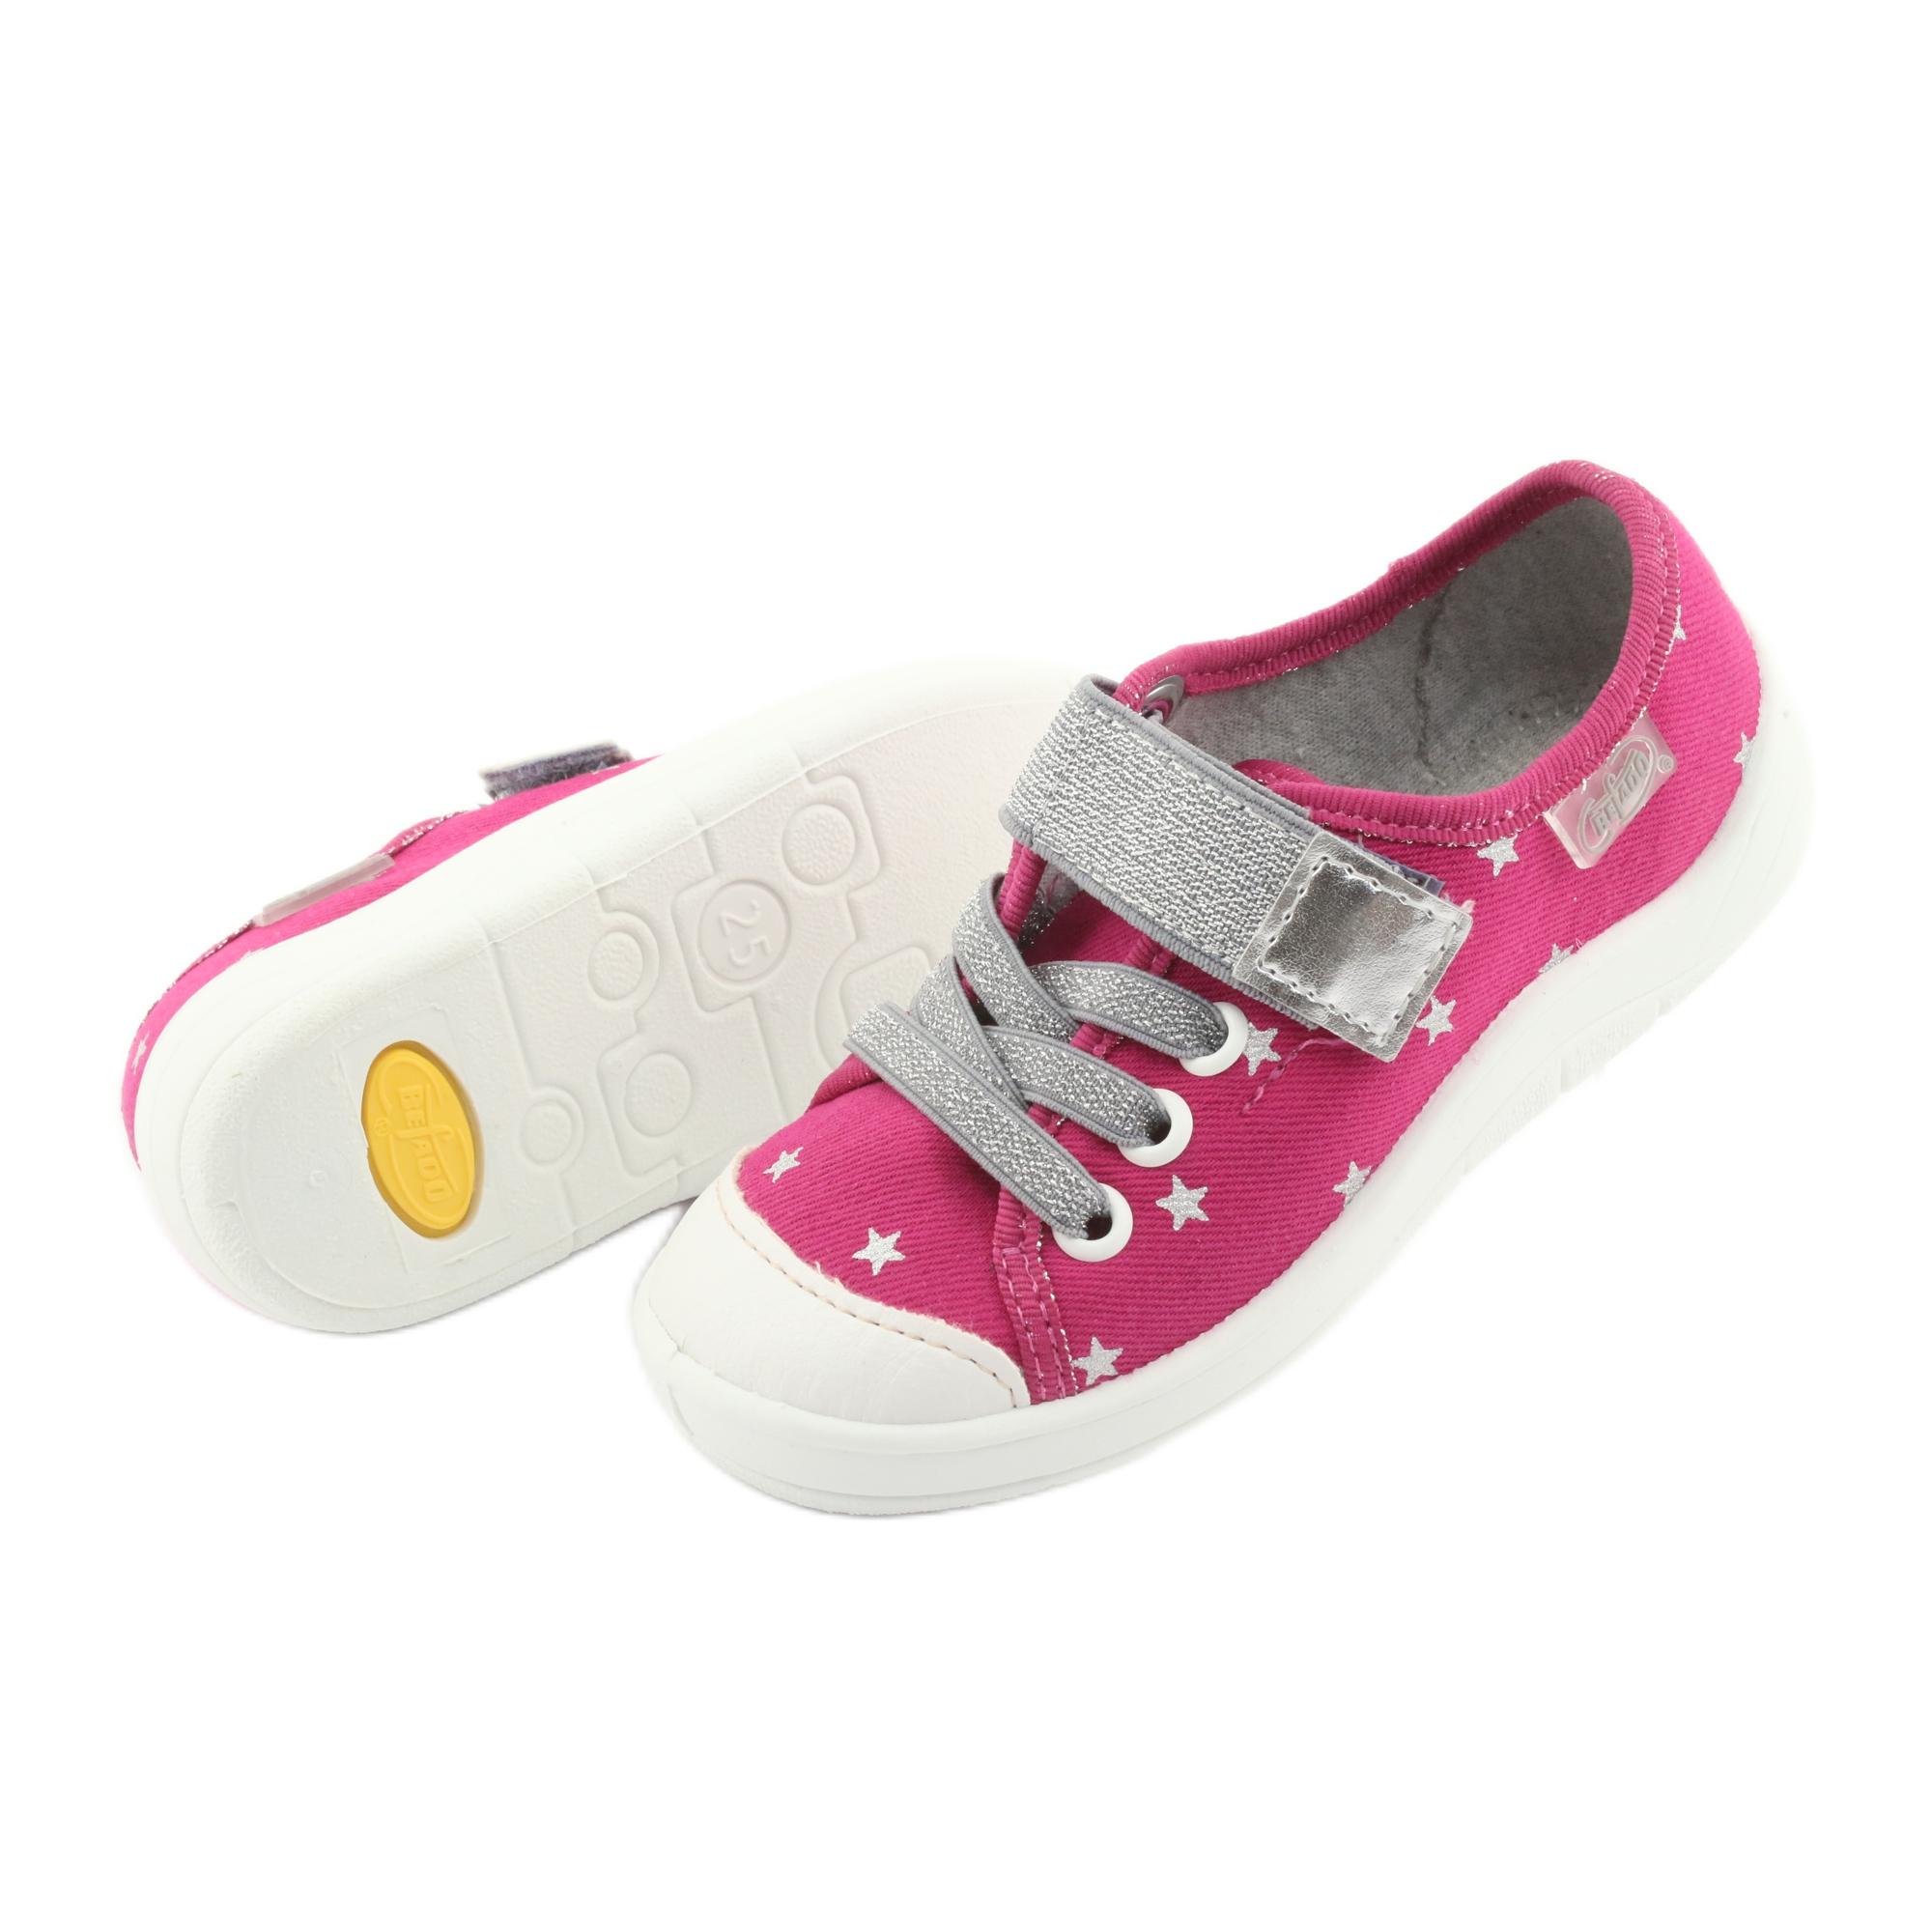 5a52fff4eb Pink Befado Kinderschuhe 251X106 - ButyModne.pl